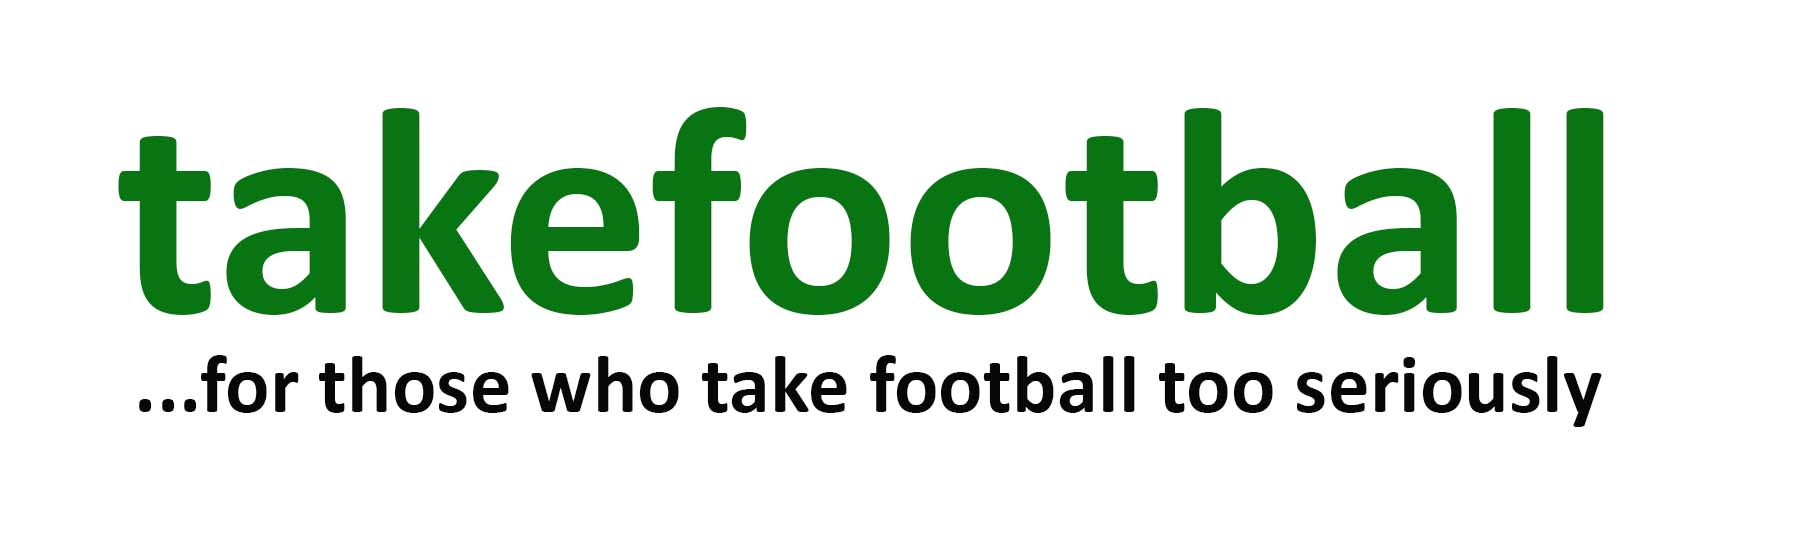 takefootball